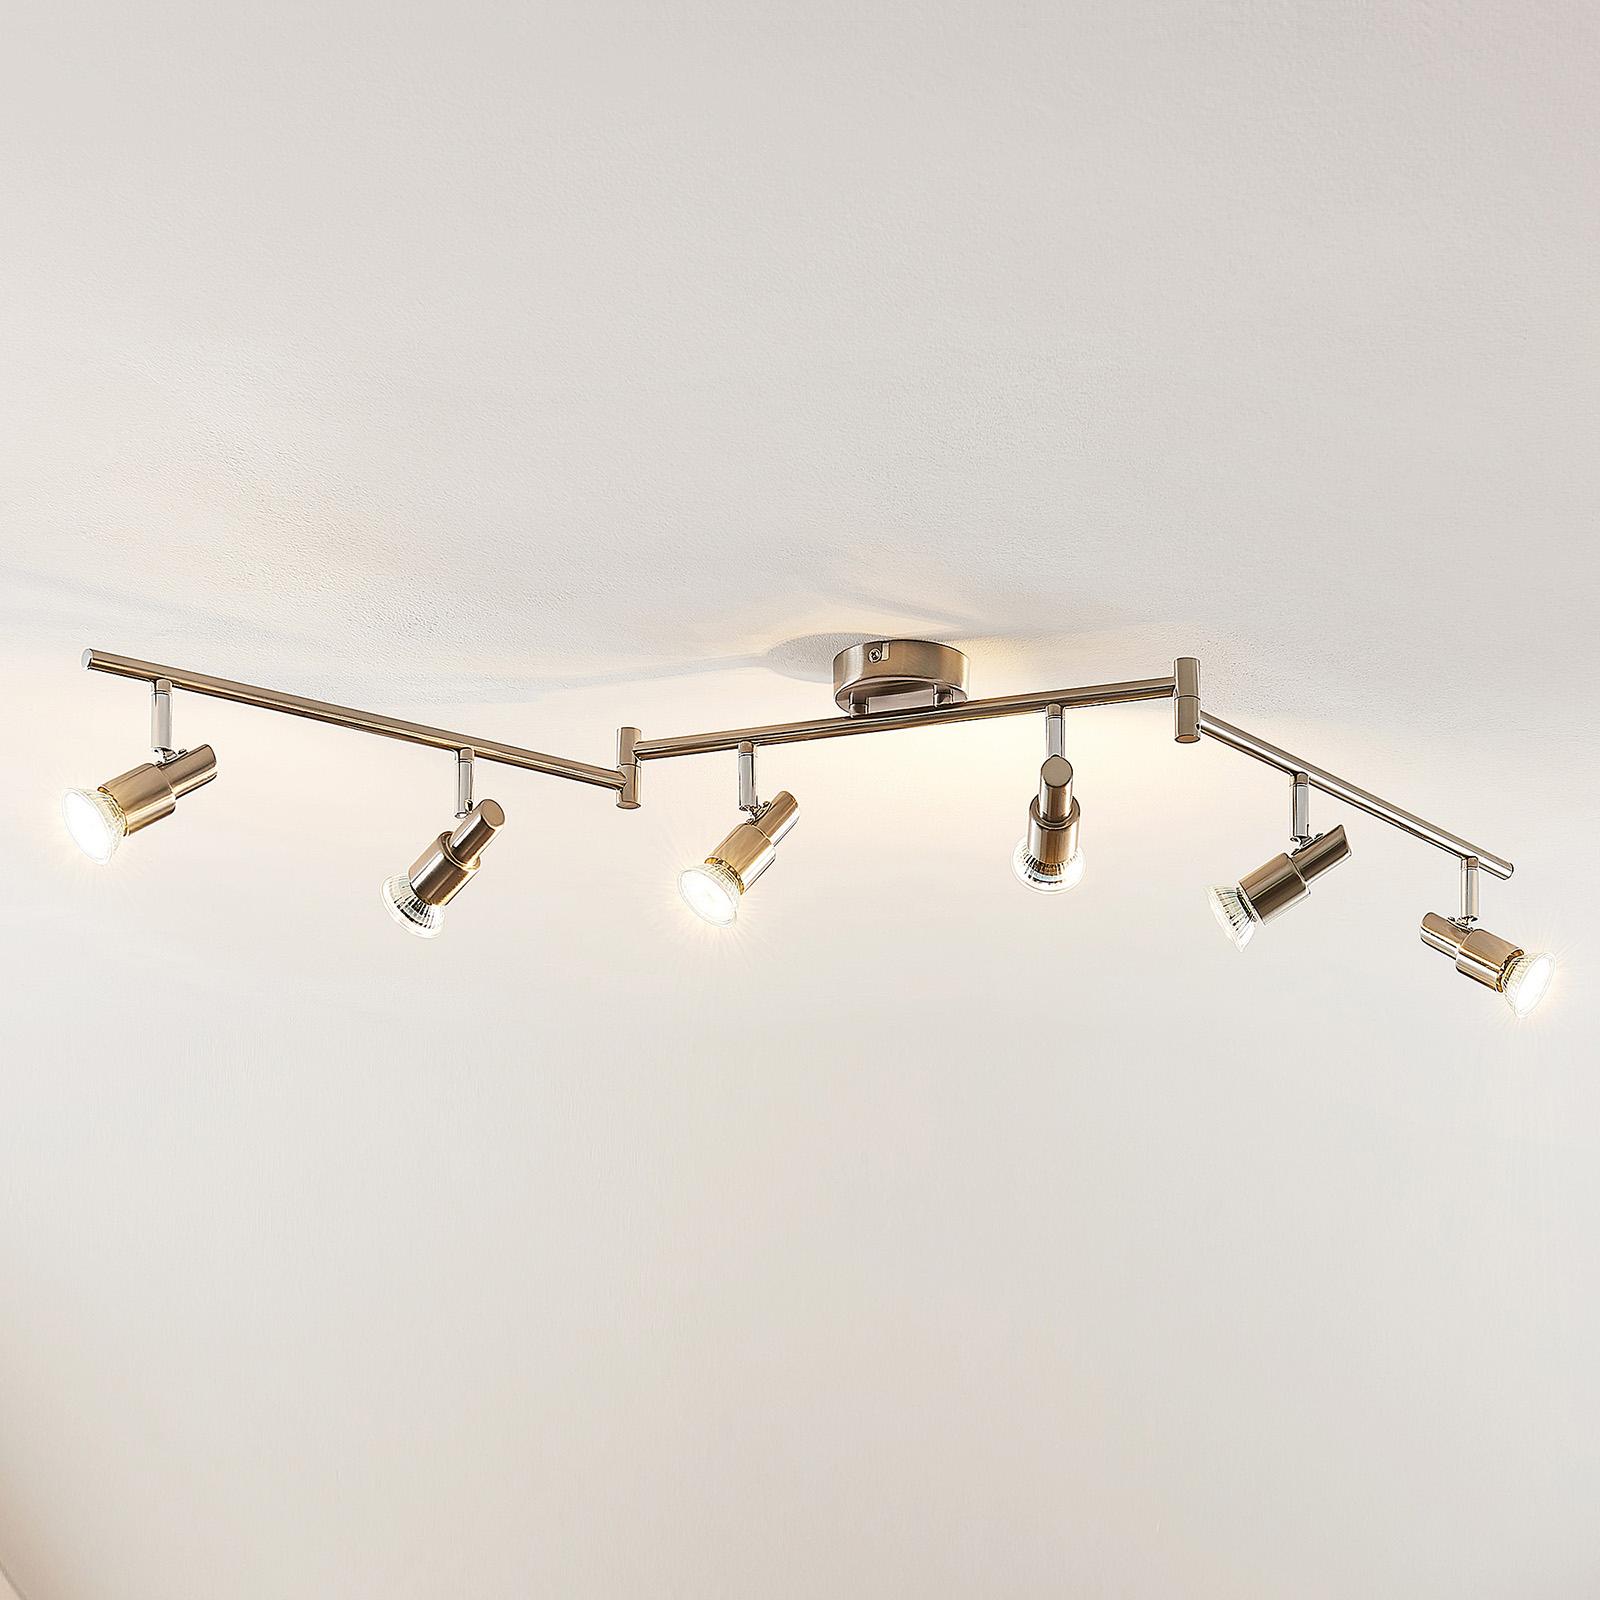 ELC Farida -LED-kohdevalo, nikkeli, 6-lamp.